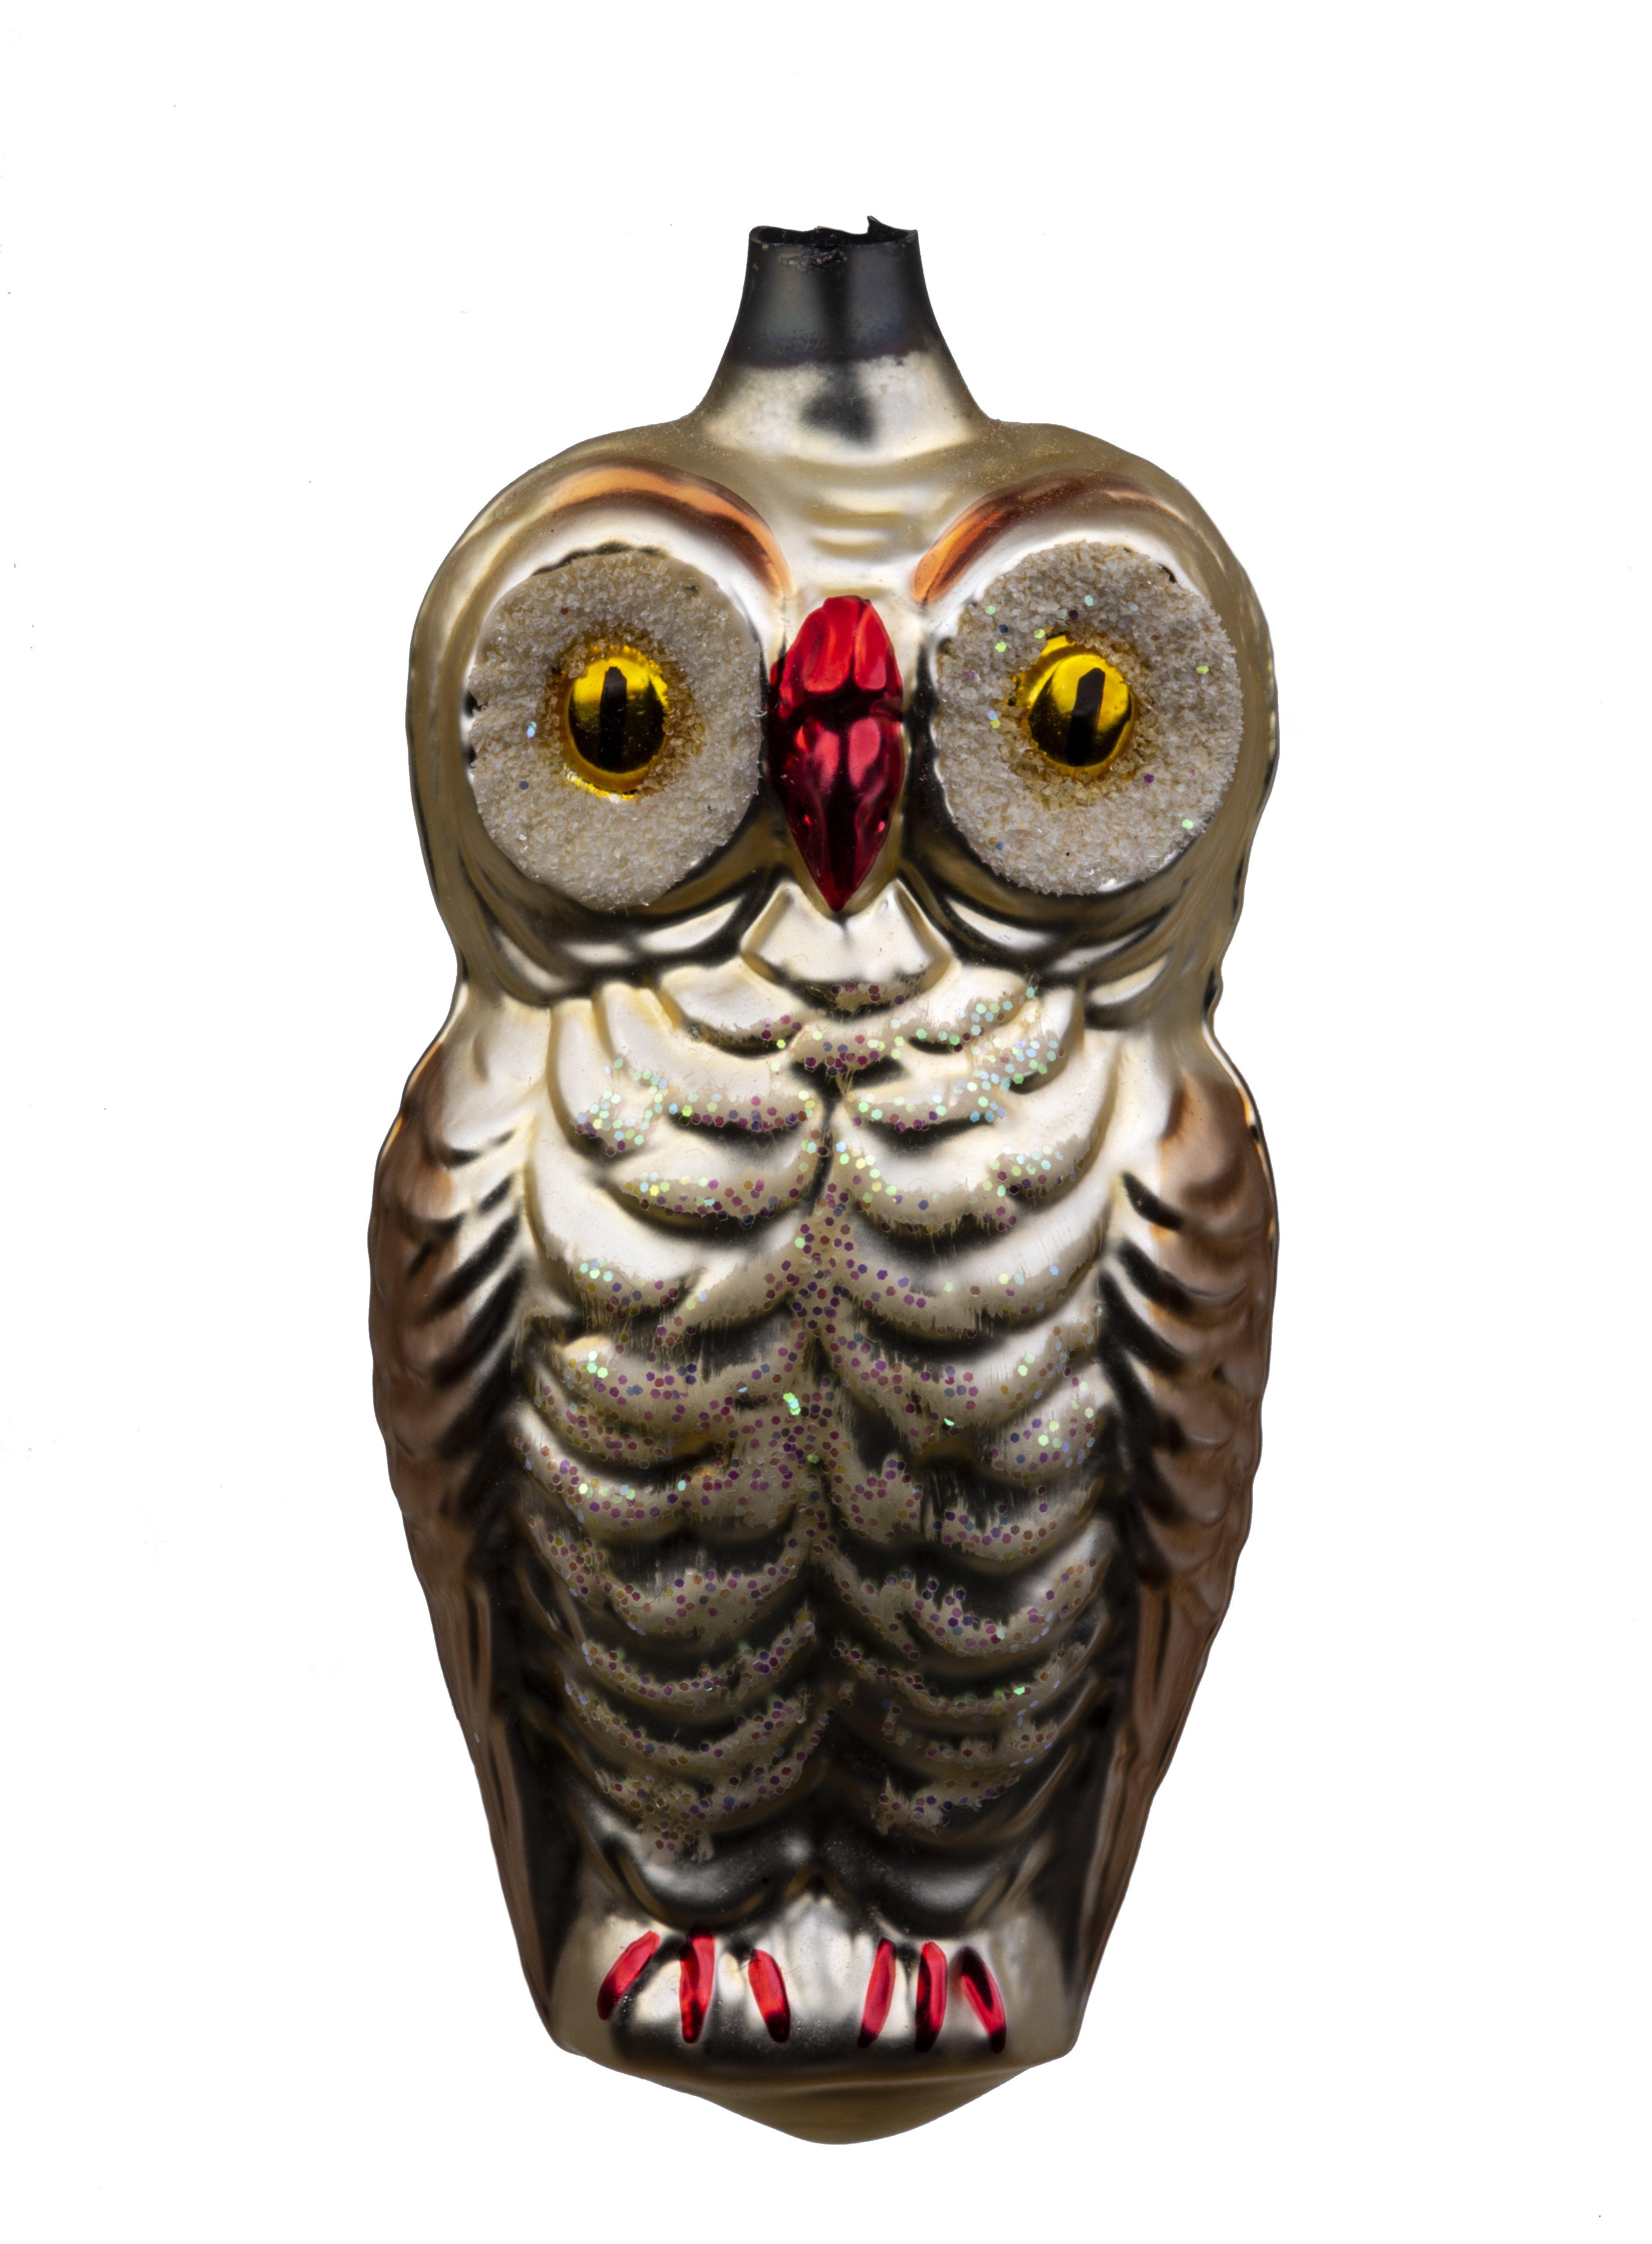 A Vintage Hand Blown Glass Christmas Tree Ornament Of An Owl Artzze